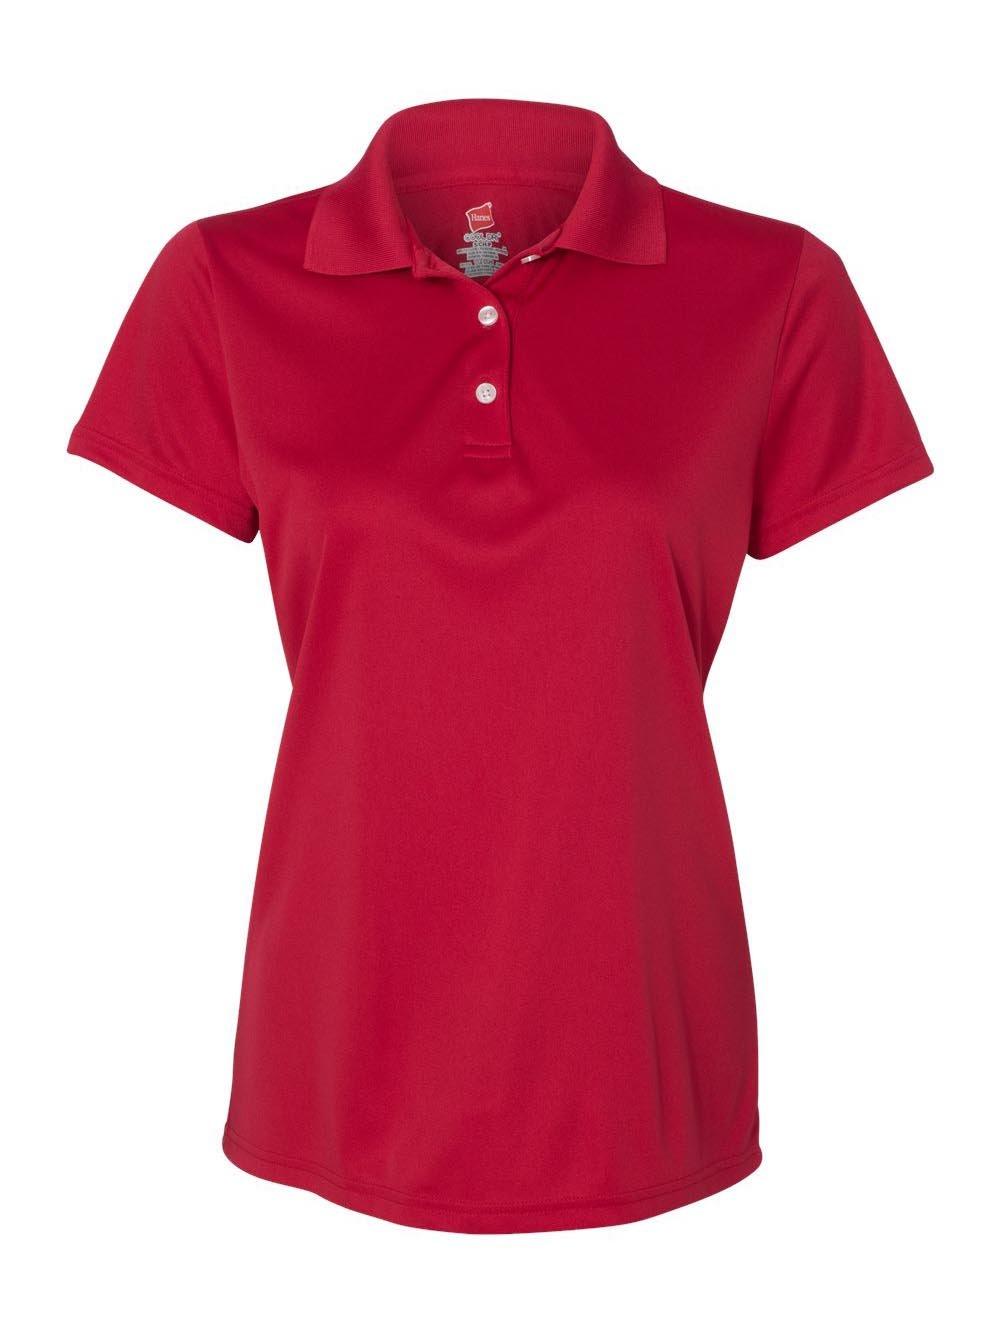 Hanes Women's Cool Dri Sportshirt, Medium, Deep Red